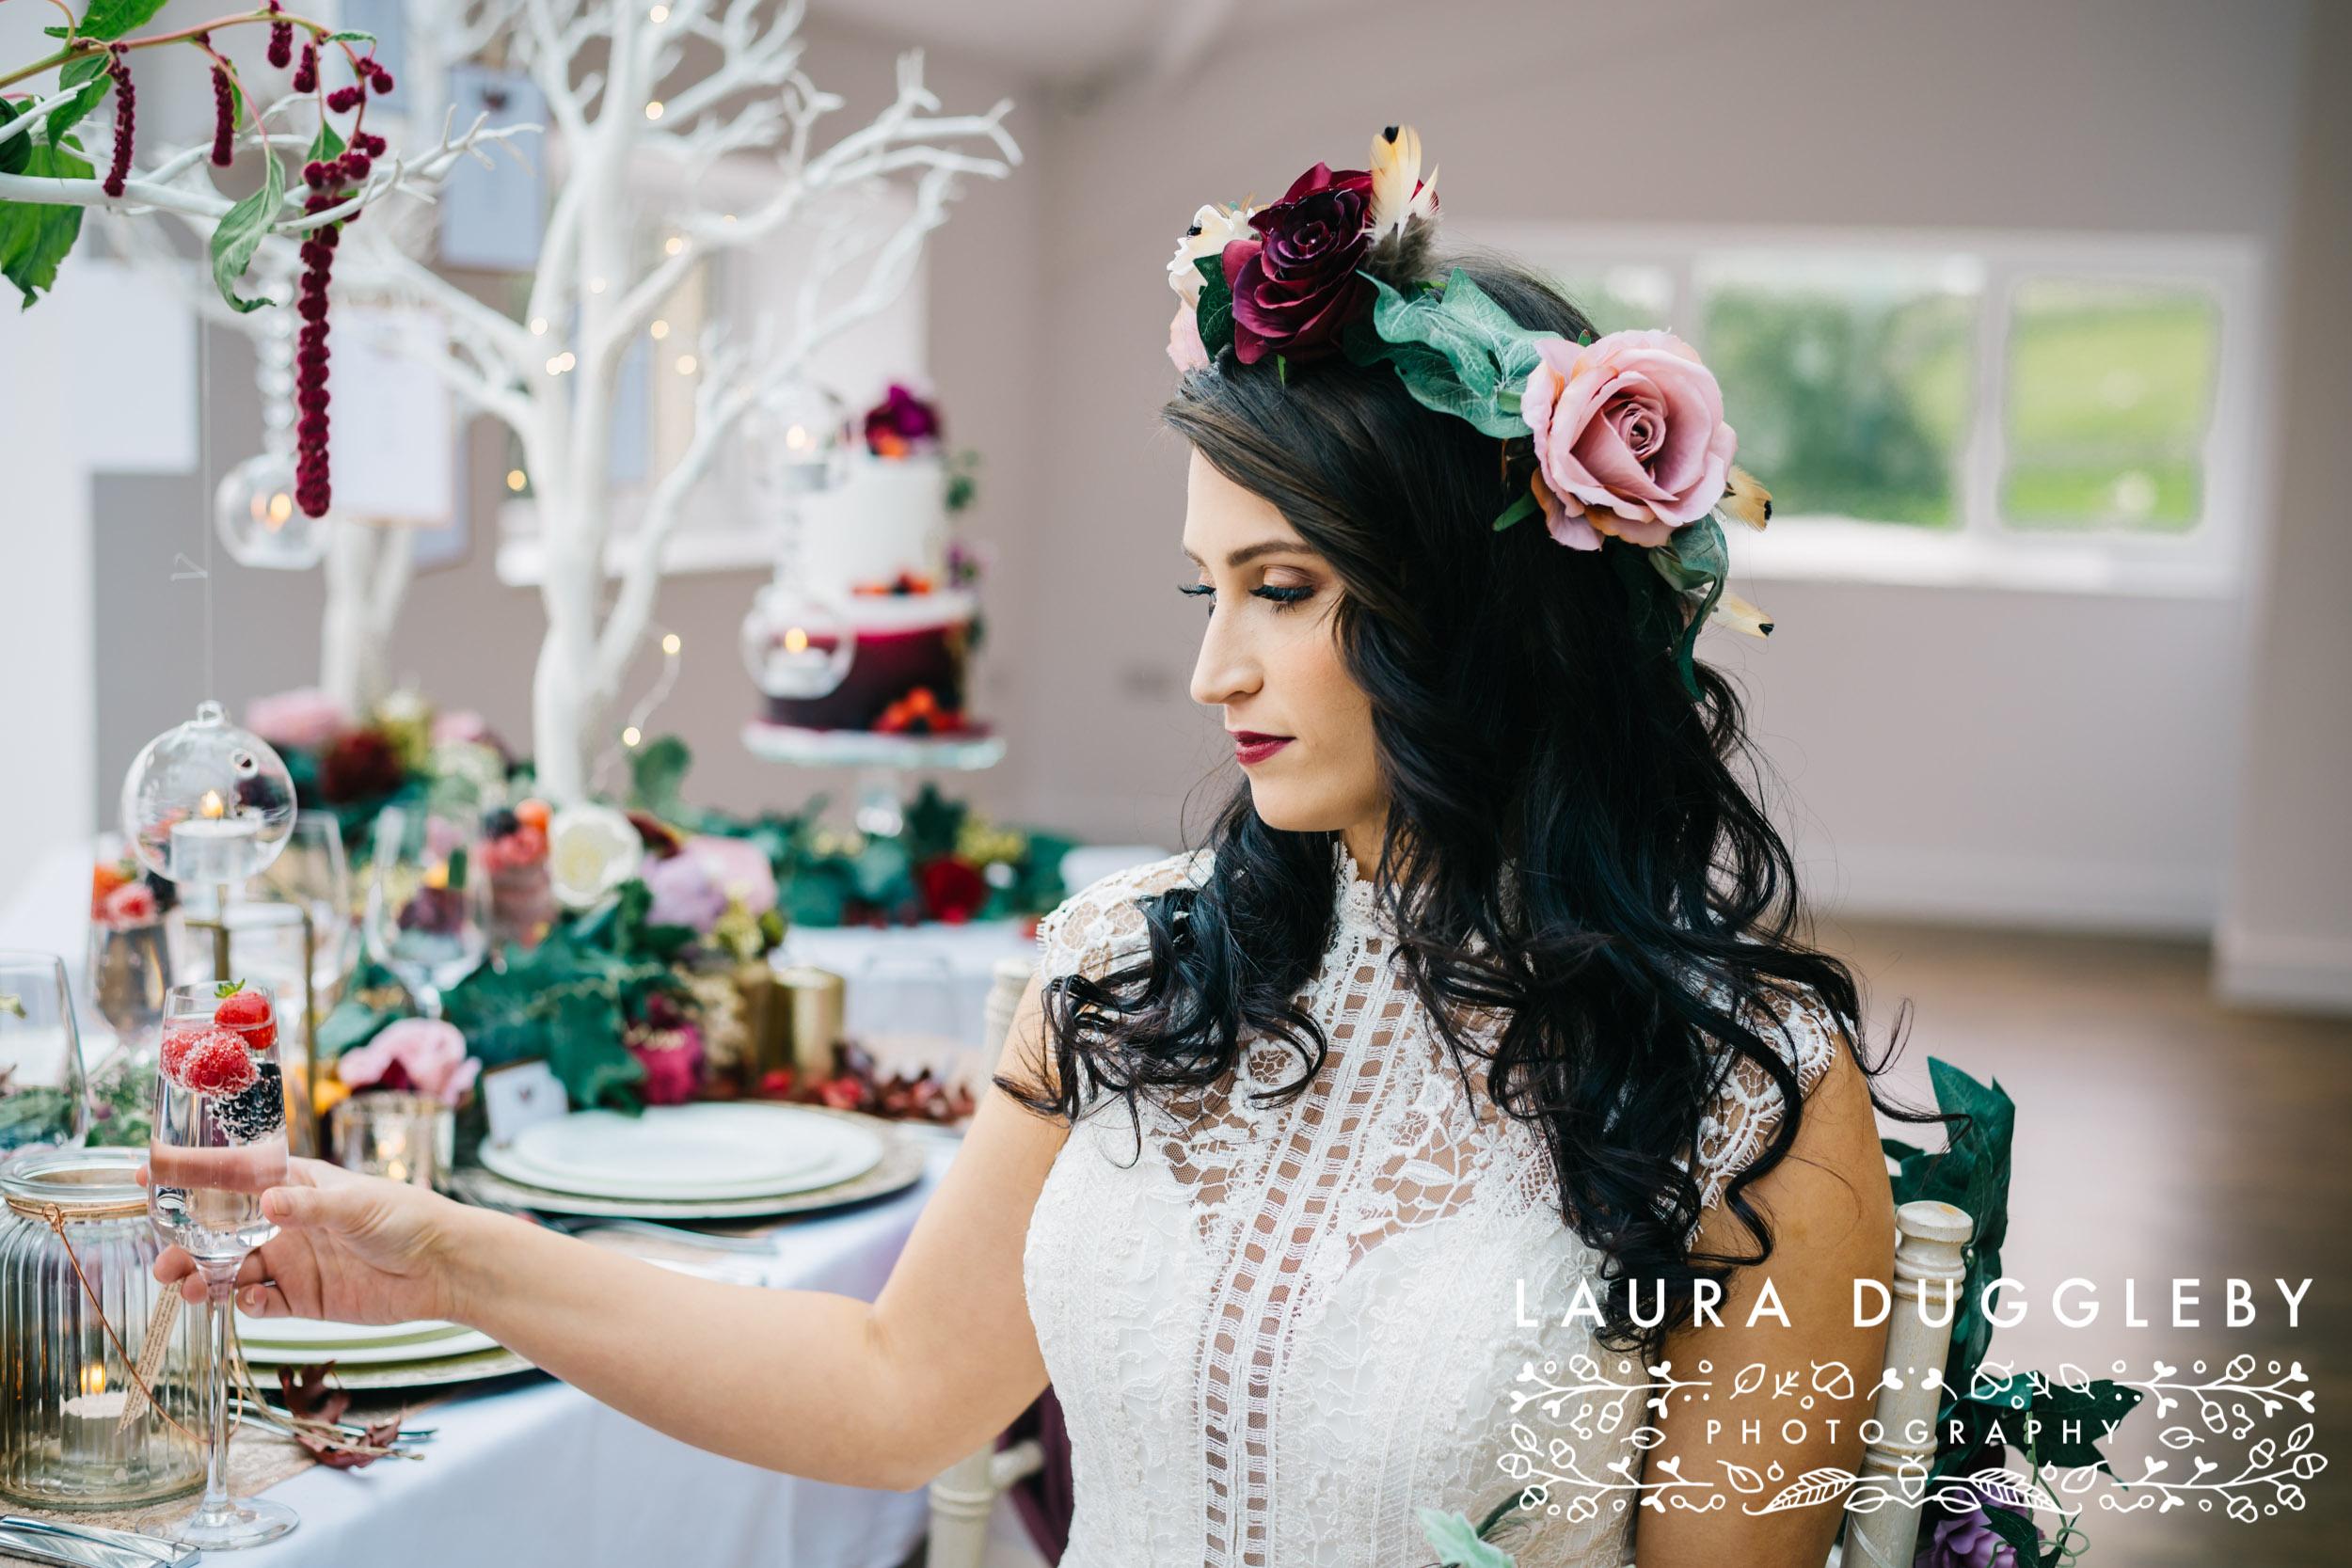 Thornton Hall Country Park Wedding Photographer-42.jpg